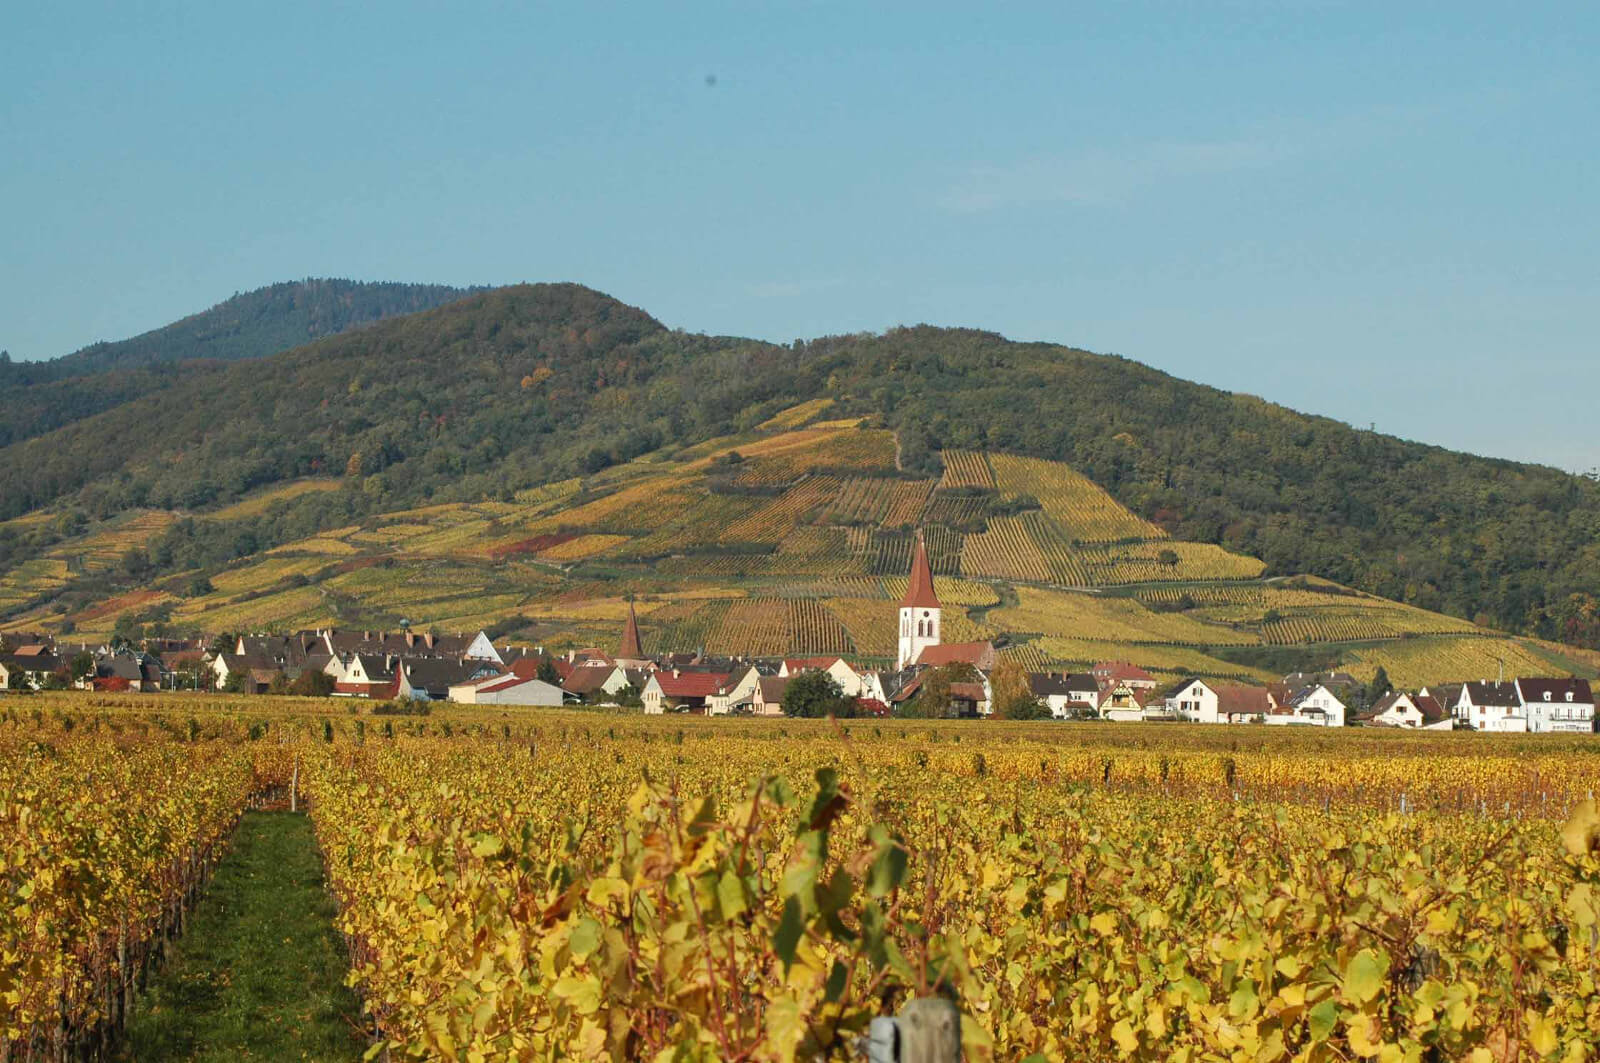 apps.tourisme-alsace.info/photos/kaysersberg/photos/gite-ammerschwihr-meyer-doris-village-d-ammerschwihe.JPG